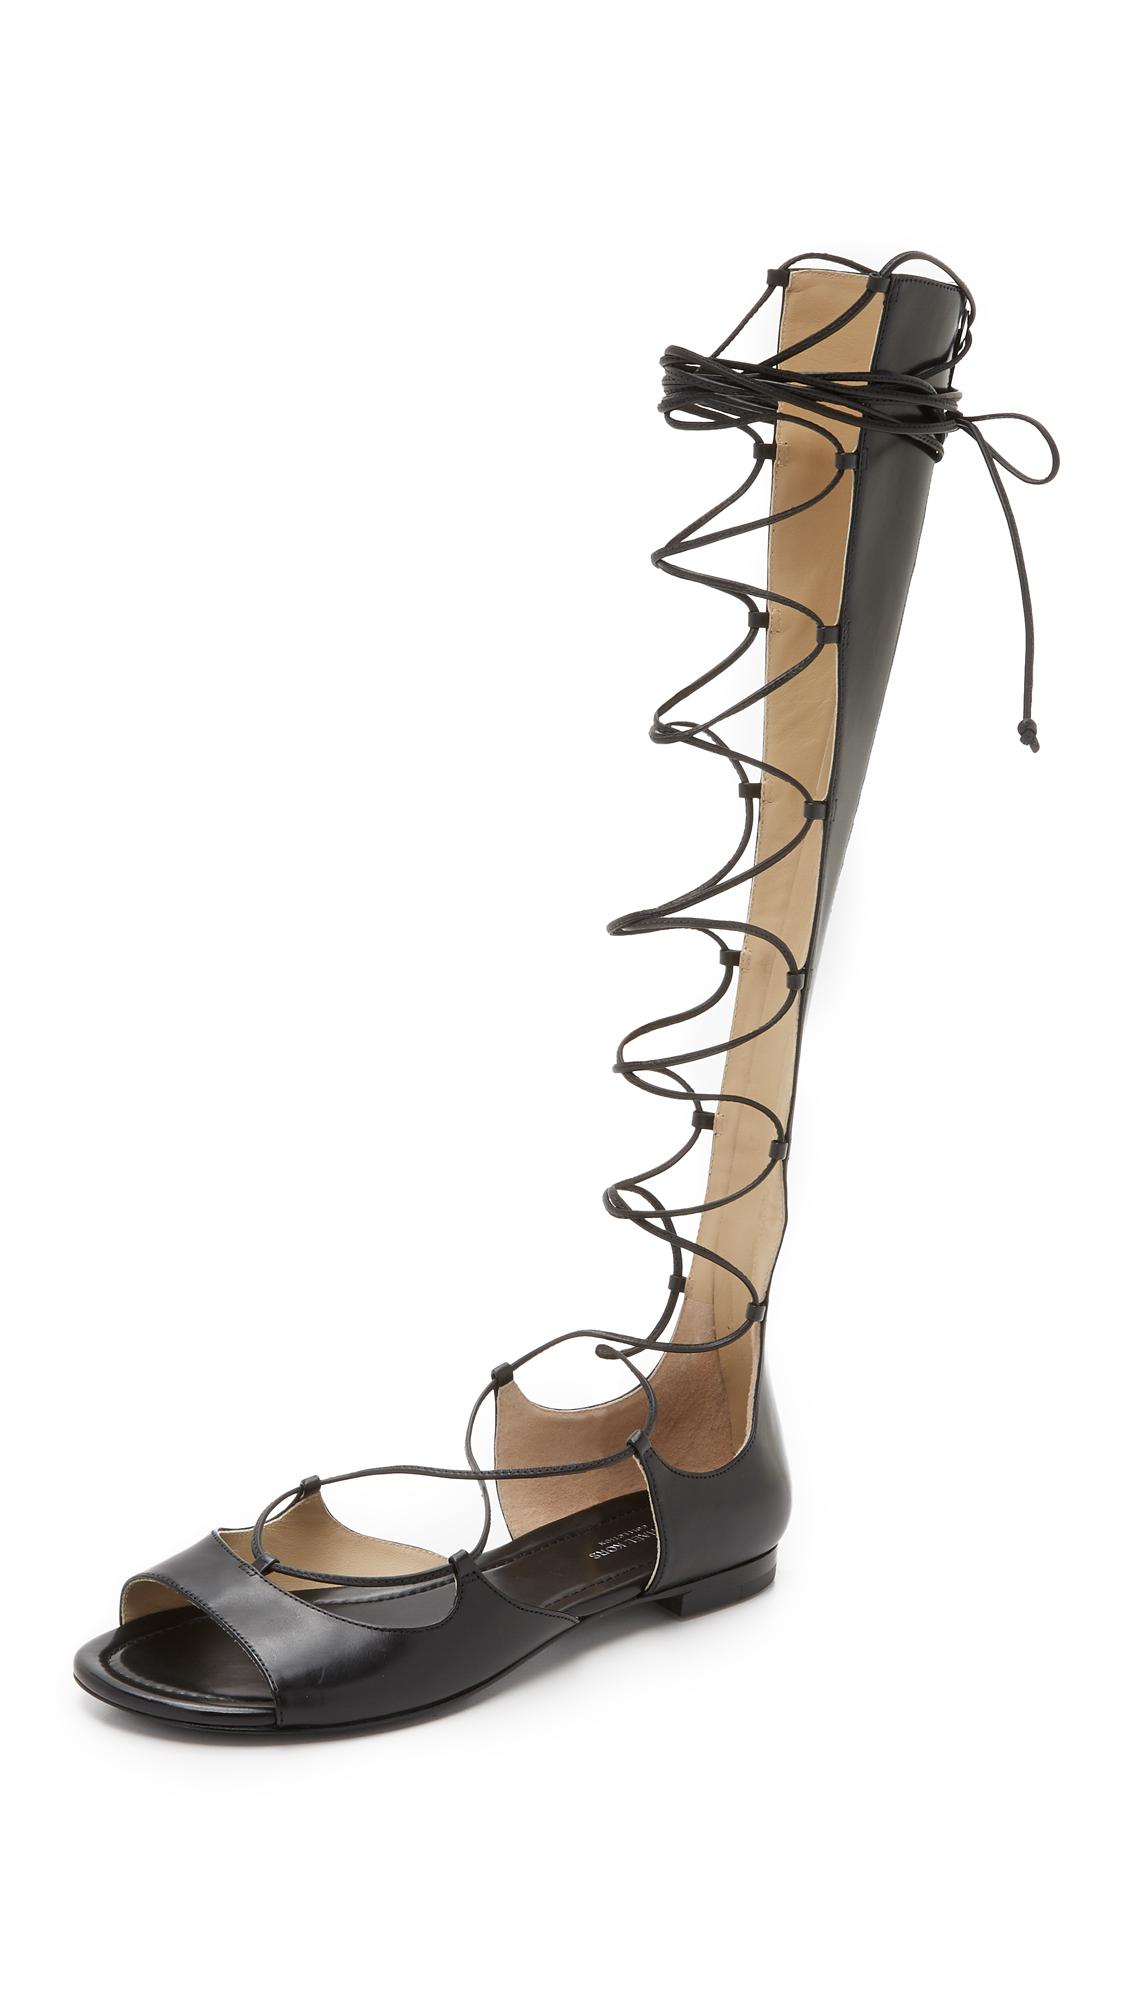 michael kors female 188971 michael kors collection birdie lace up gladiator sandals black